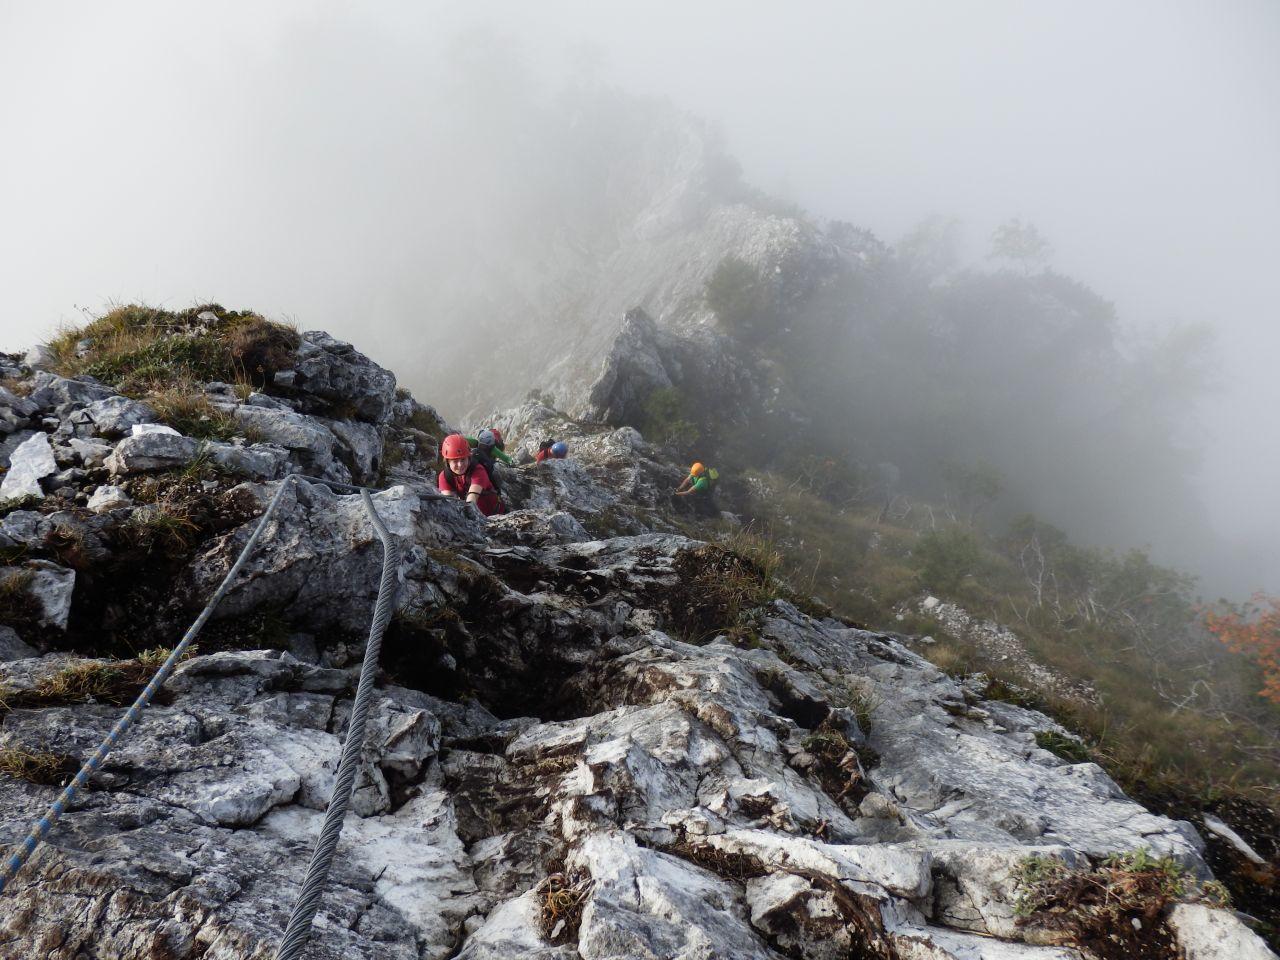 Klettersteig Mahdlgupf : Klettersteig mahdlgupf alpenverein